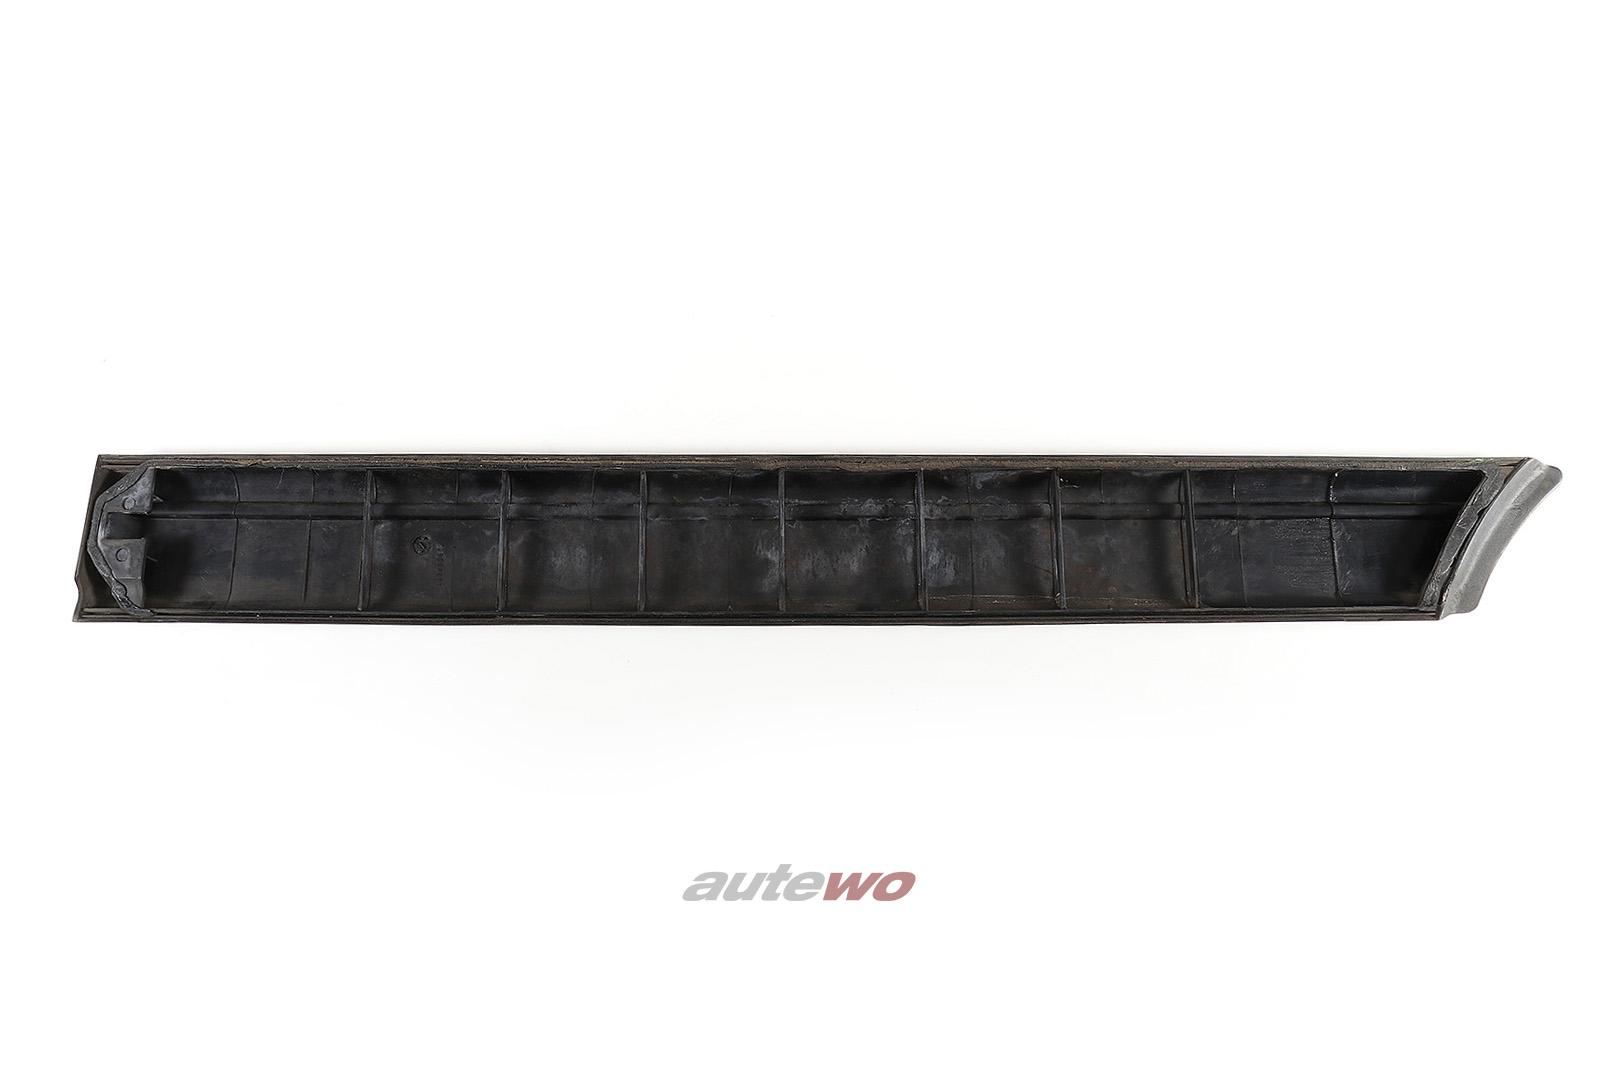 443853962C Audi 100 Typ 44 Schutzleiste Tür Hinten Rechts